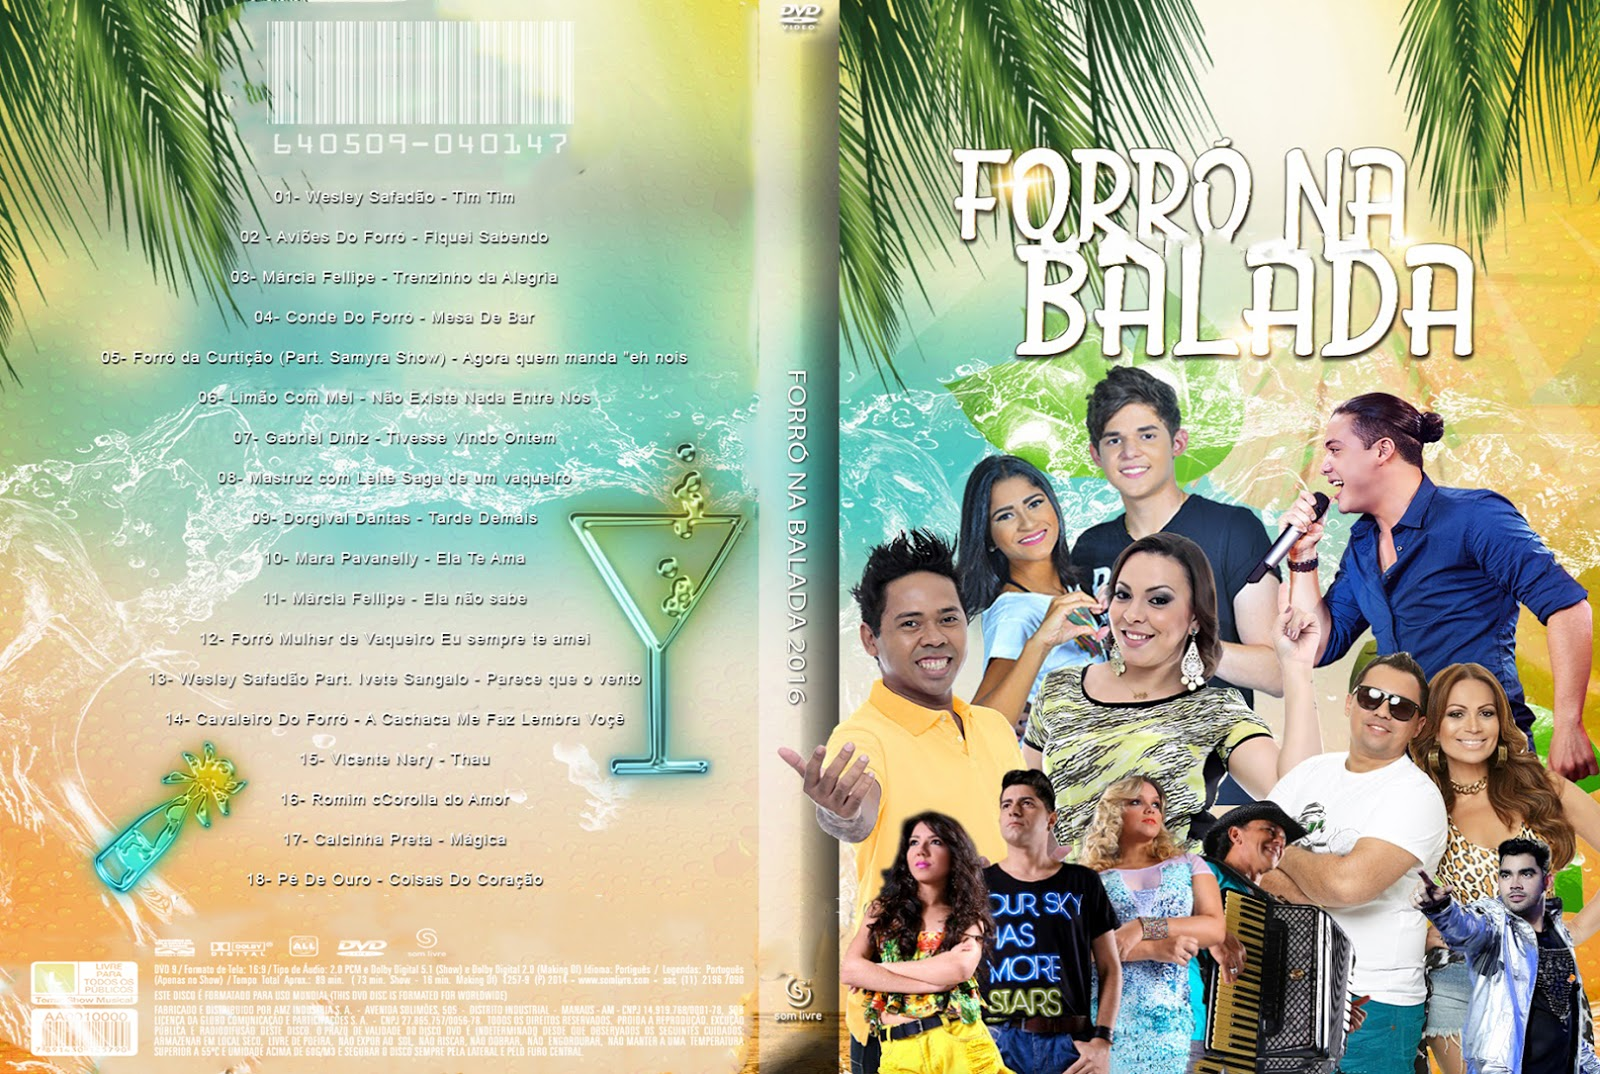 Download Forró Na Balada 2016 DVD-R Forr 25C3 25B3 2BNa 2BBalada 2BDVD R 2BXANDAODOWNLOAD